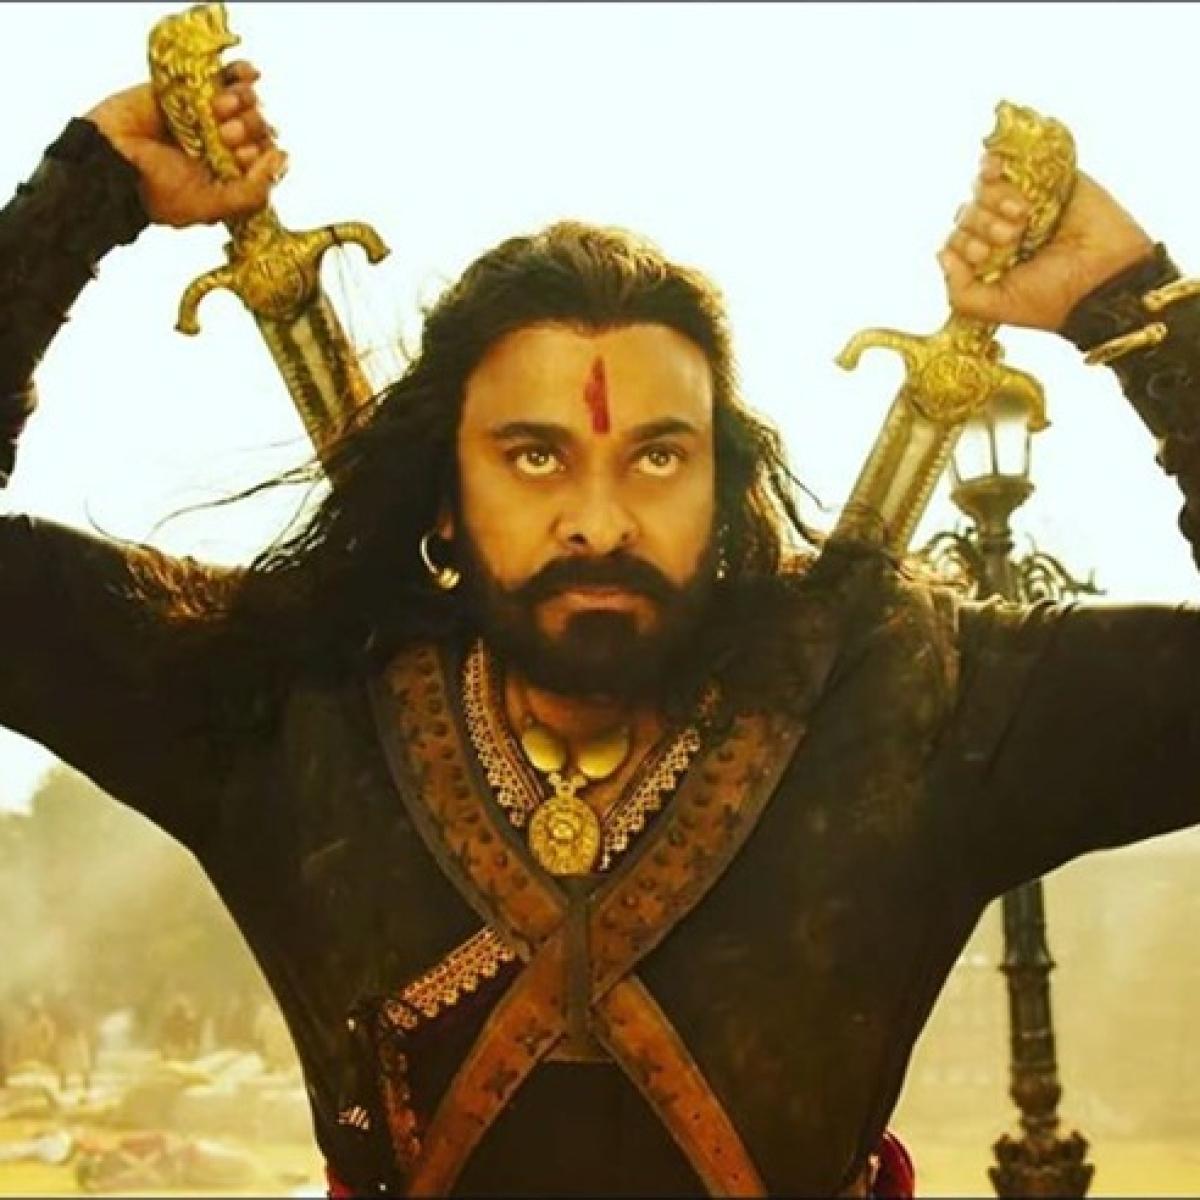 Chiranjeevi speaks on performing stunts for 'Sye Raa Narasimha Reddy'